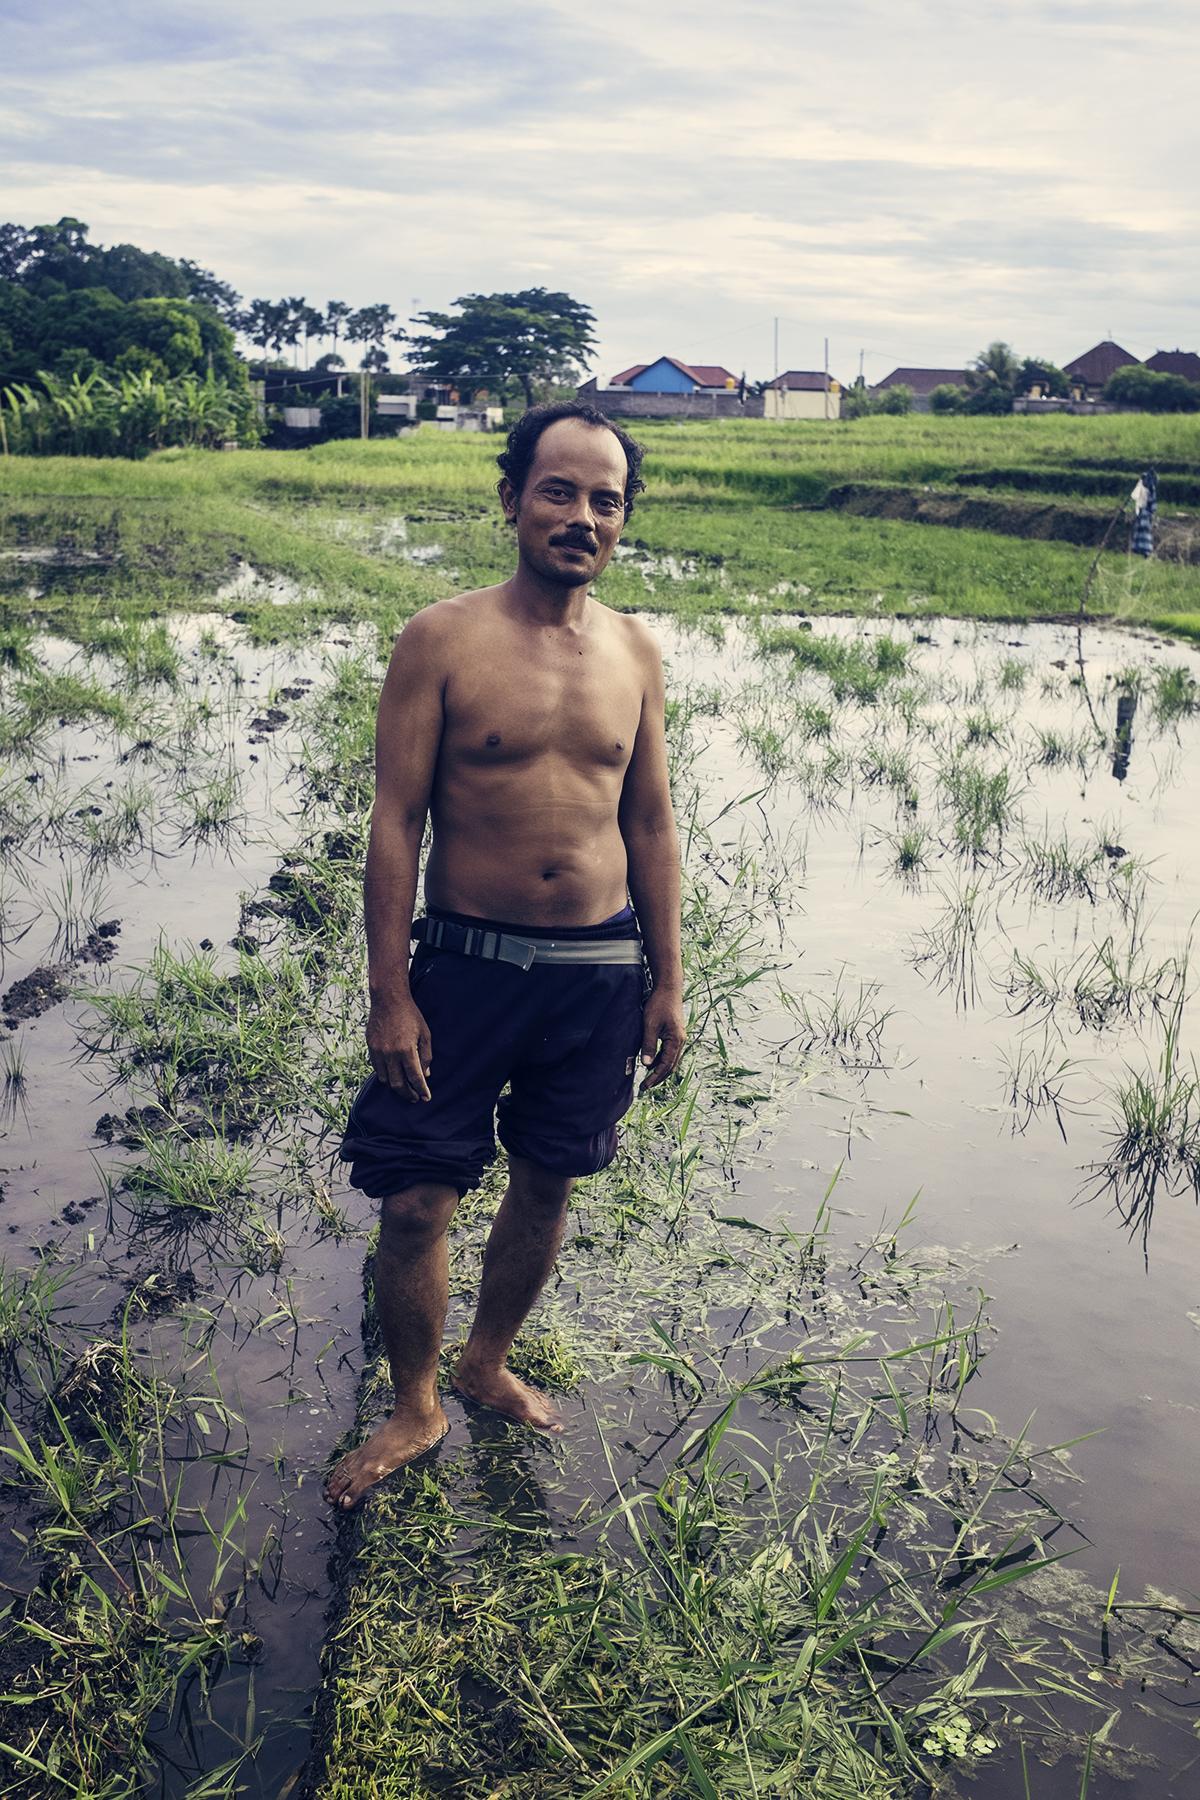 Farmer friend, Canggu